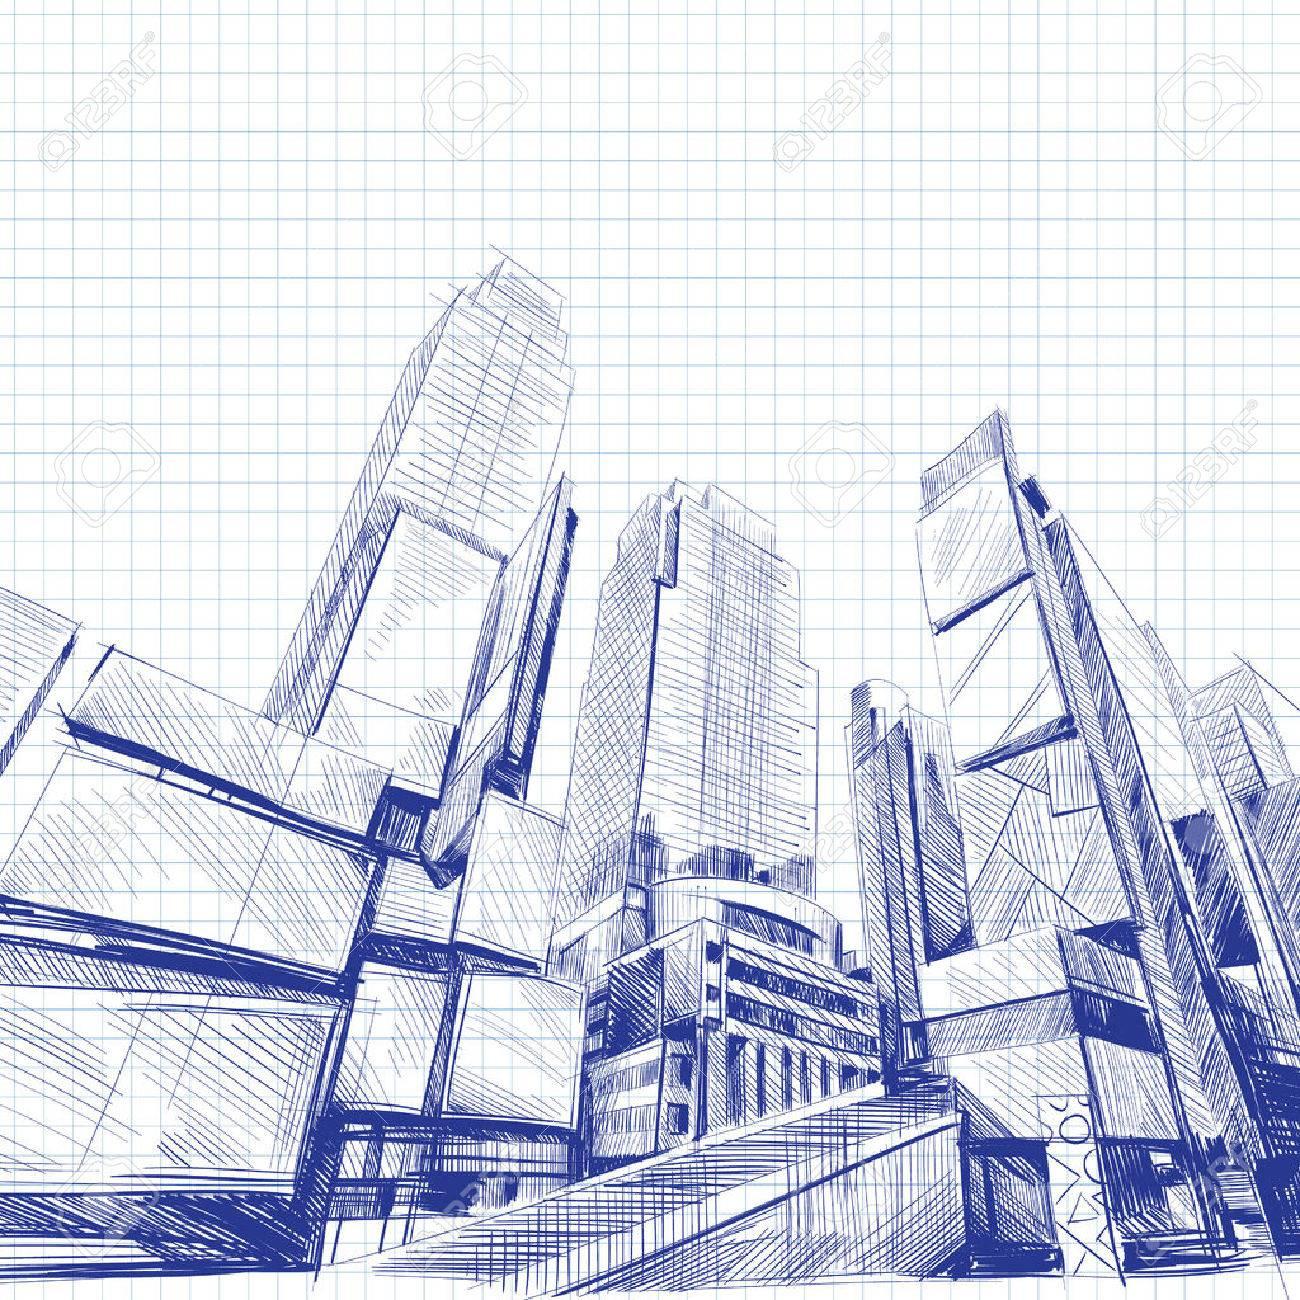 Office building hand drawn, vector illustration - 34177802